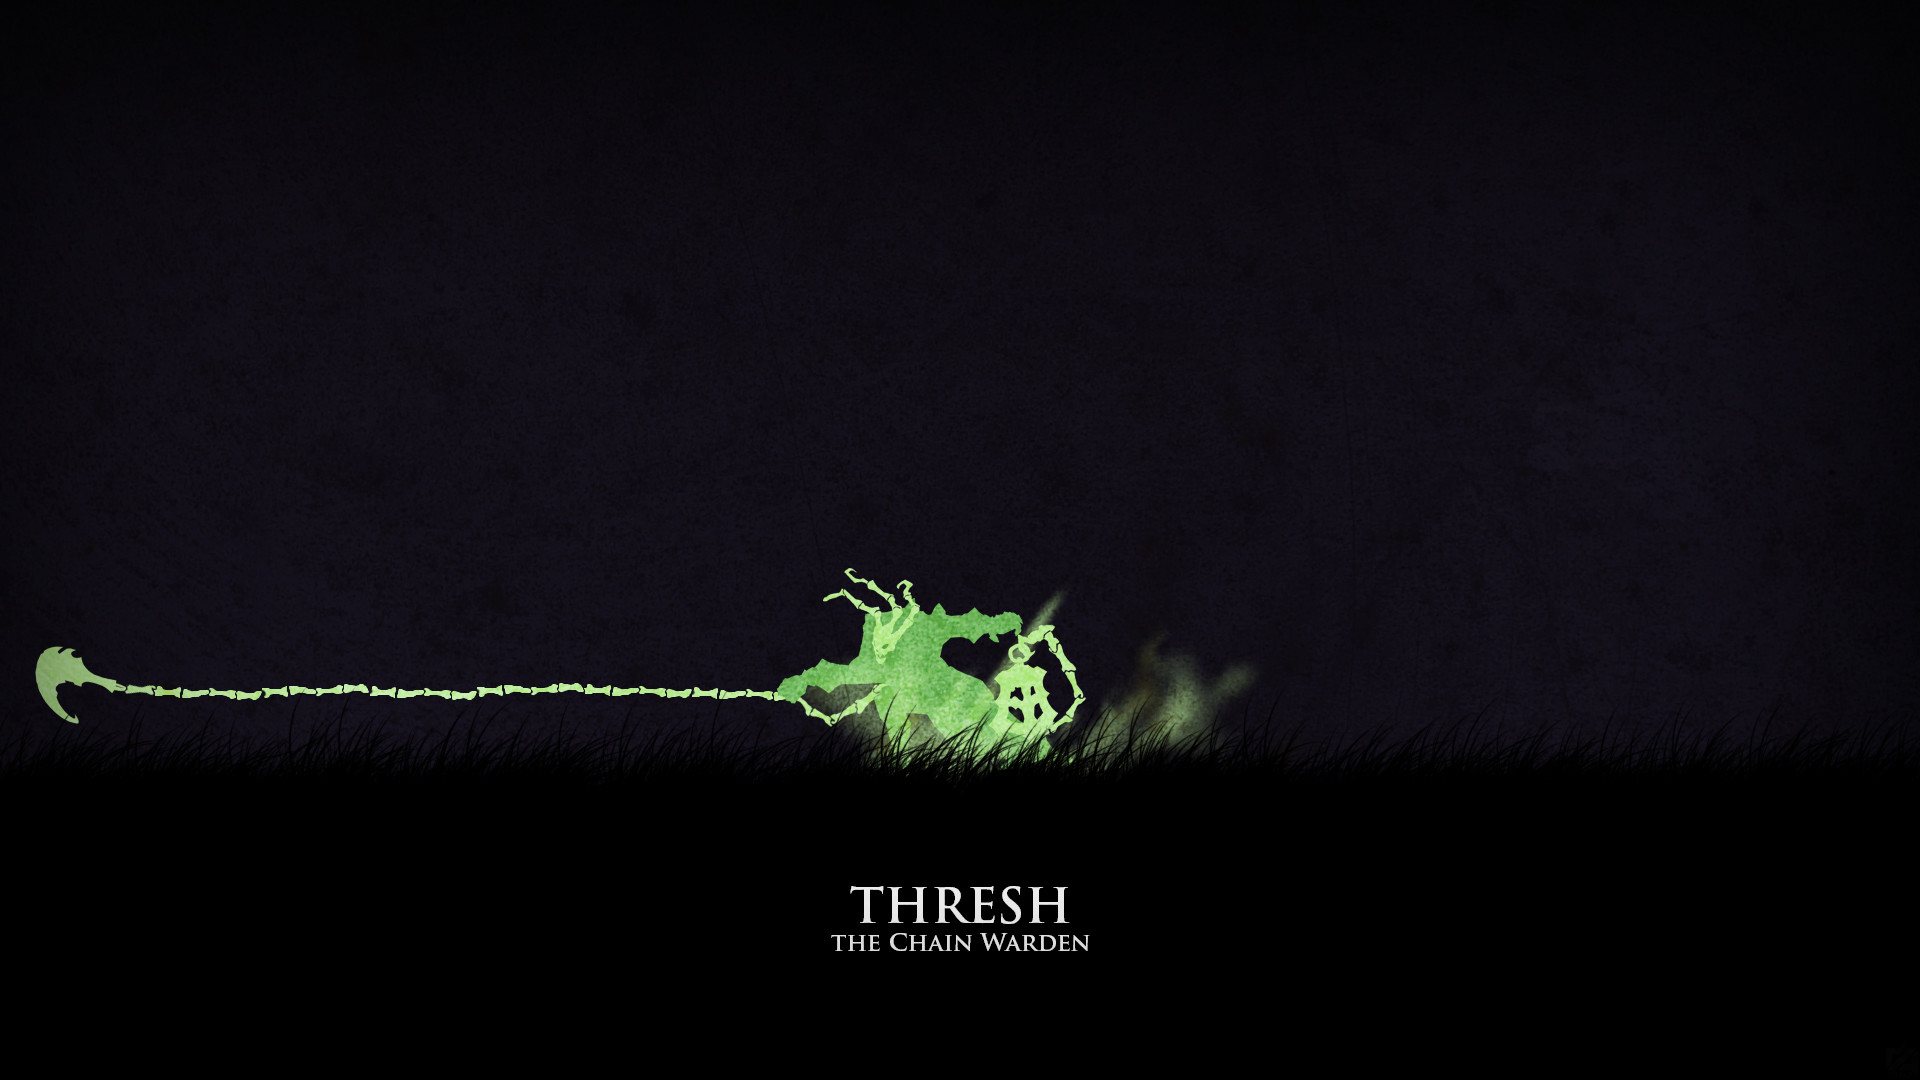 … dizap001 Thresh, the Chain Warden by dizap001